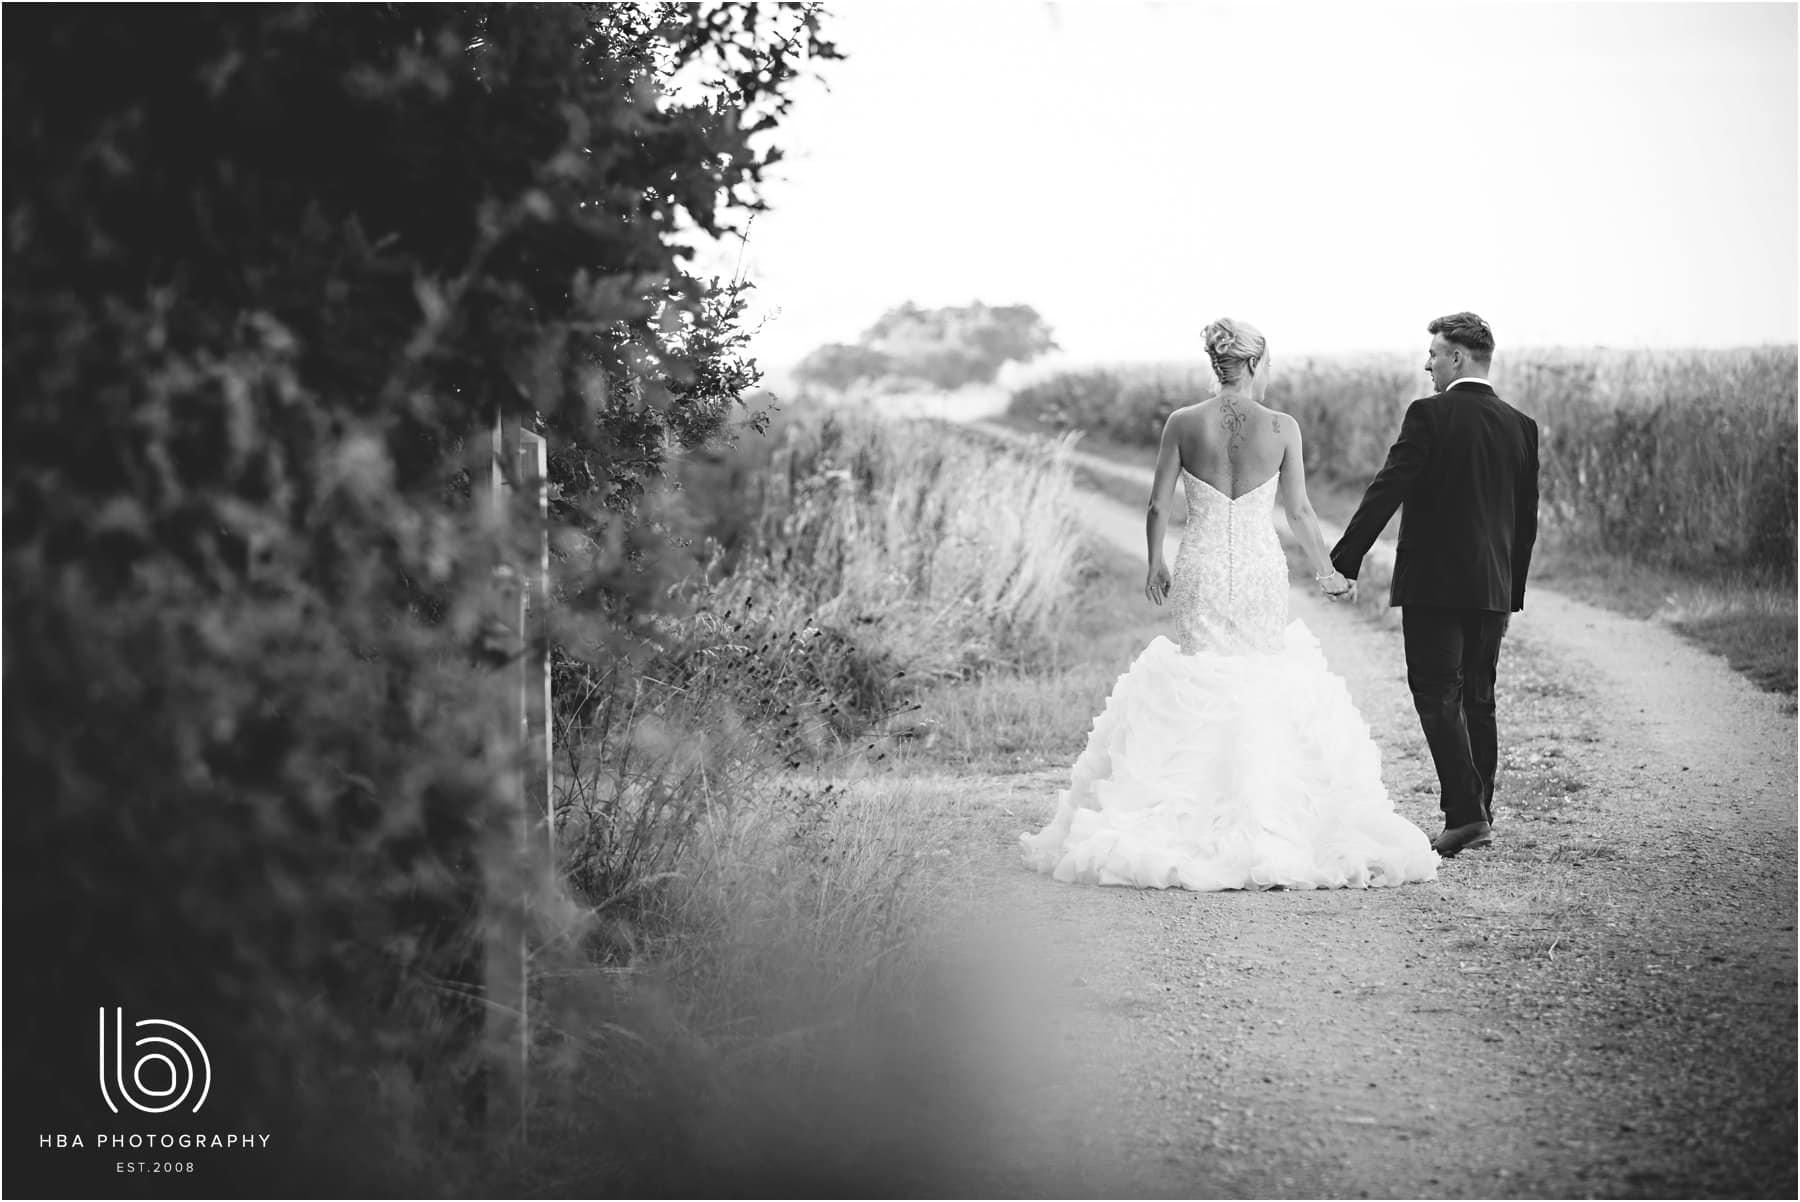 the bride & Groom walking down a path